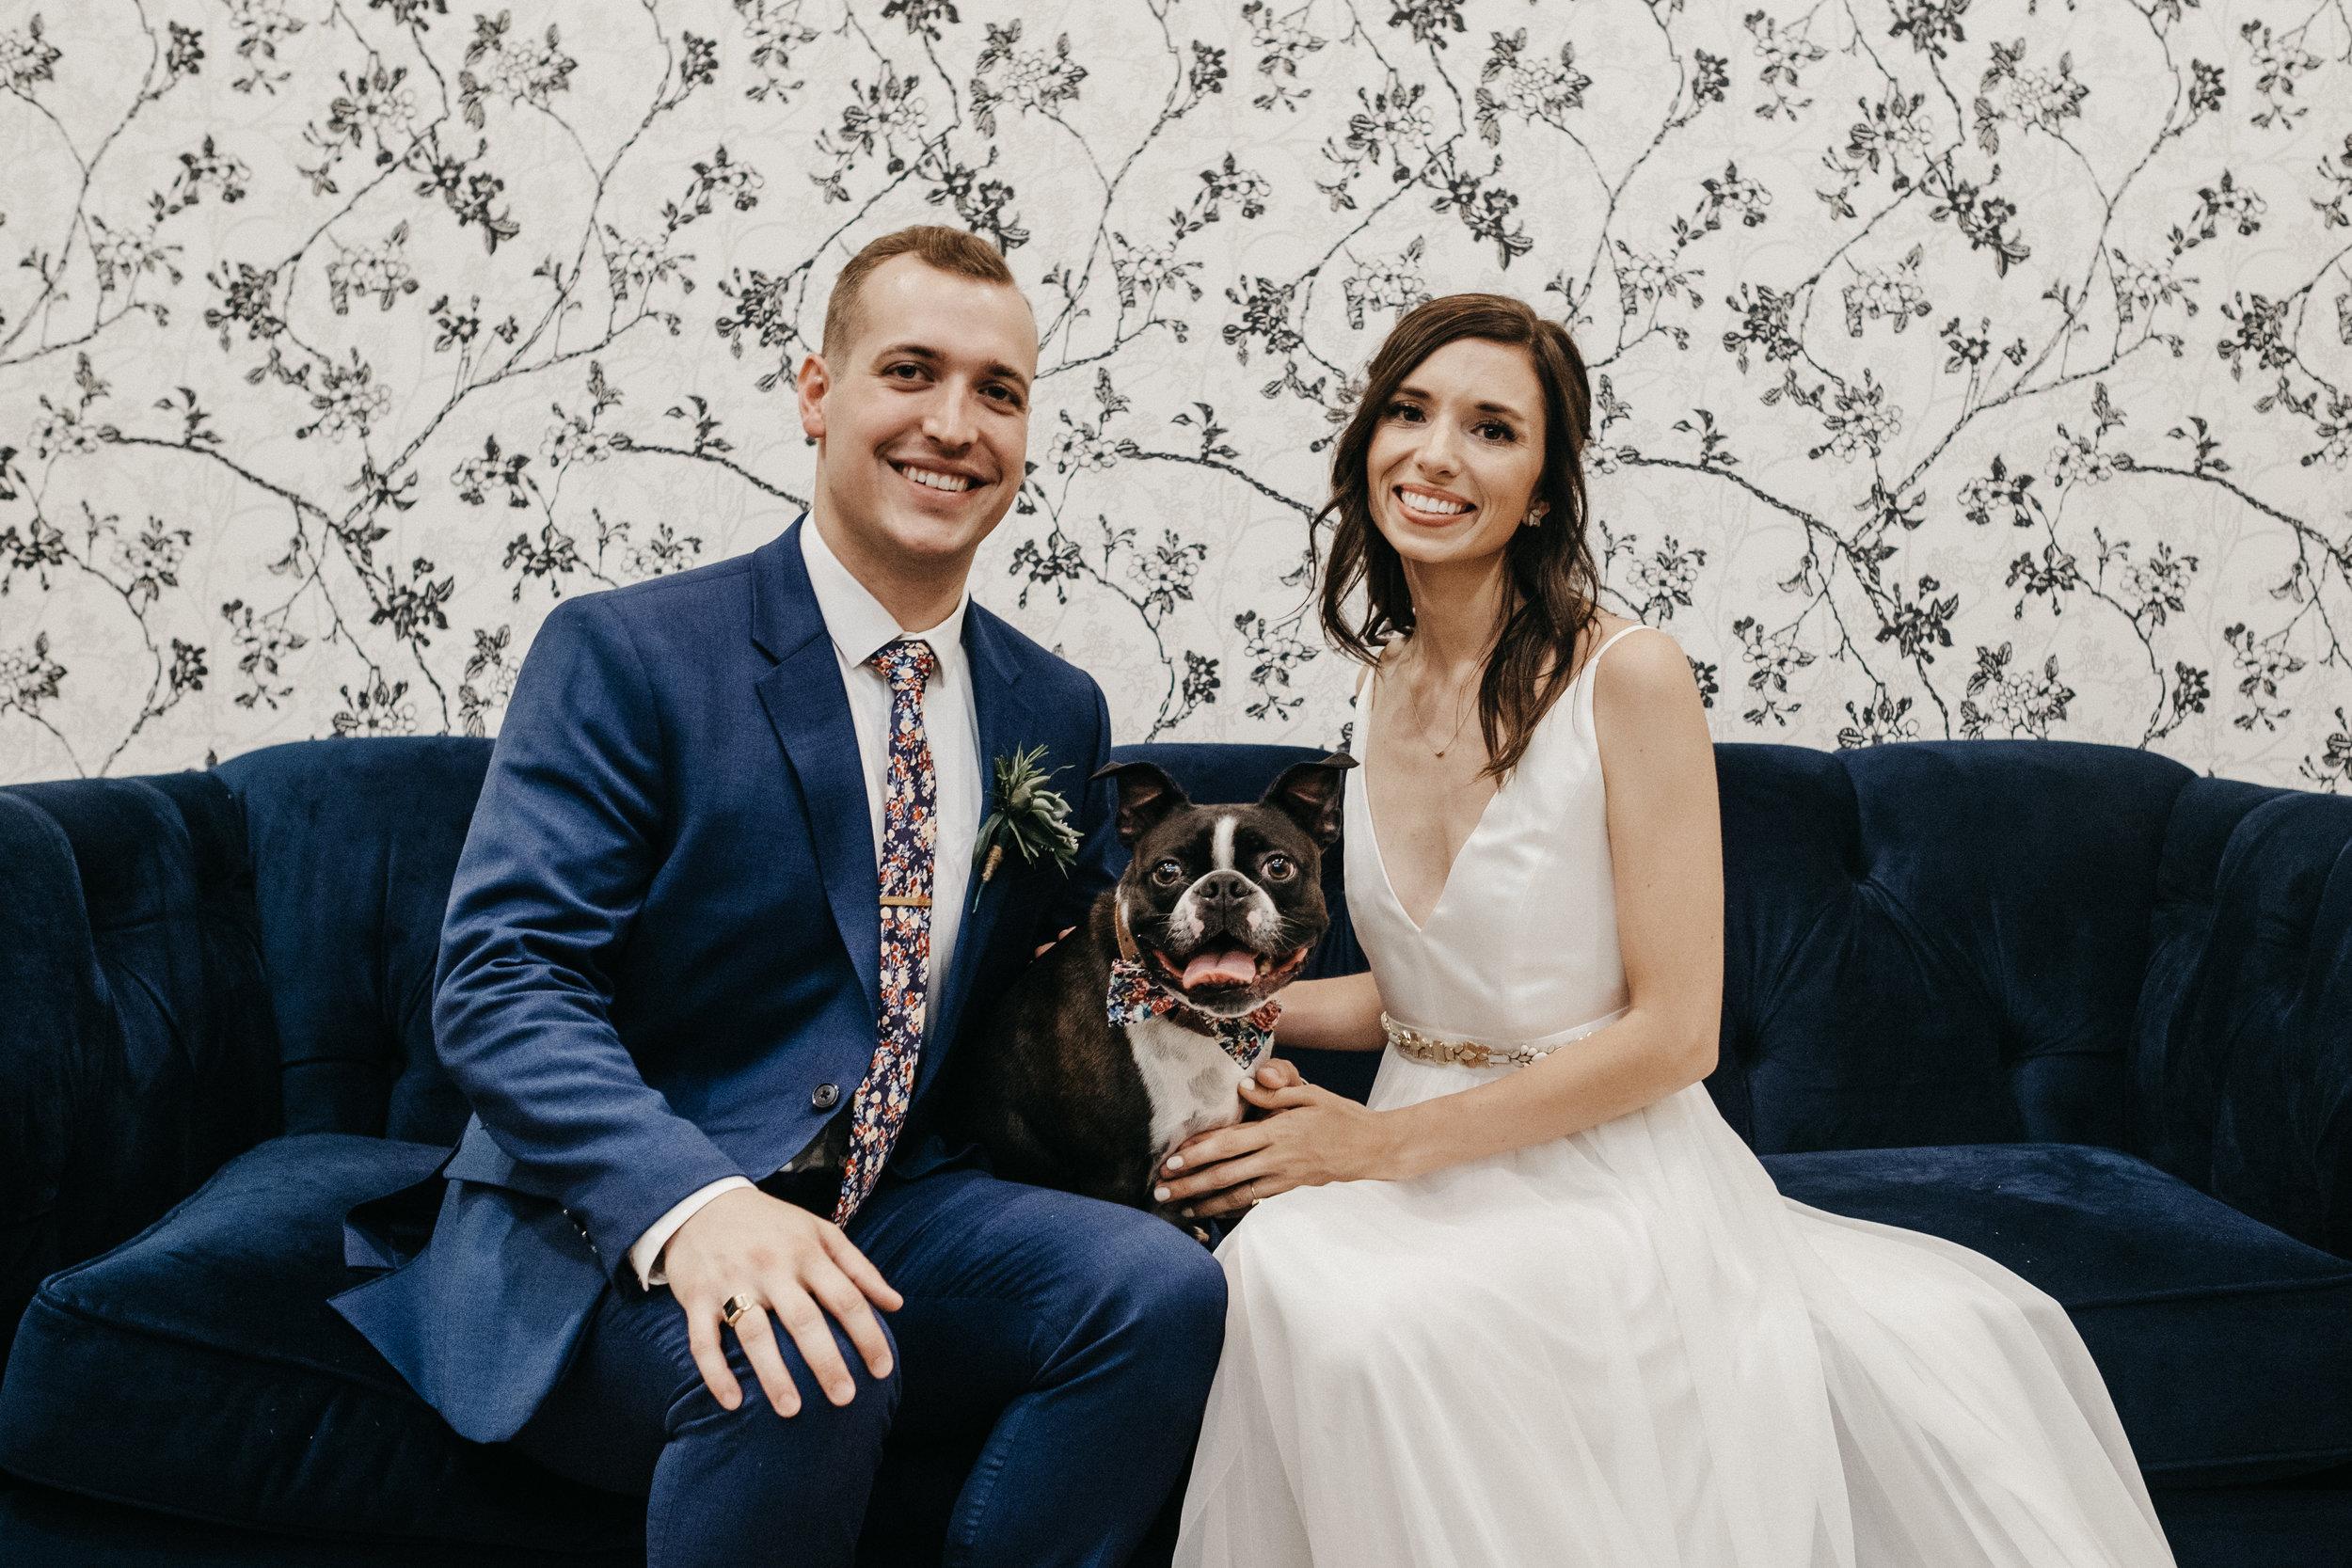 wedding_bride_groom_dog.jpg